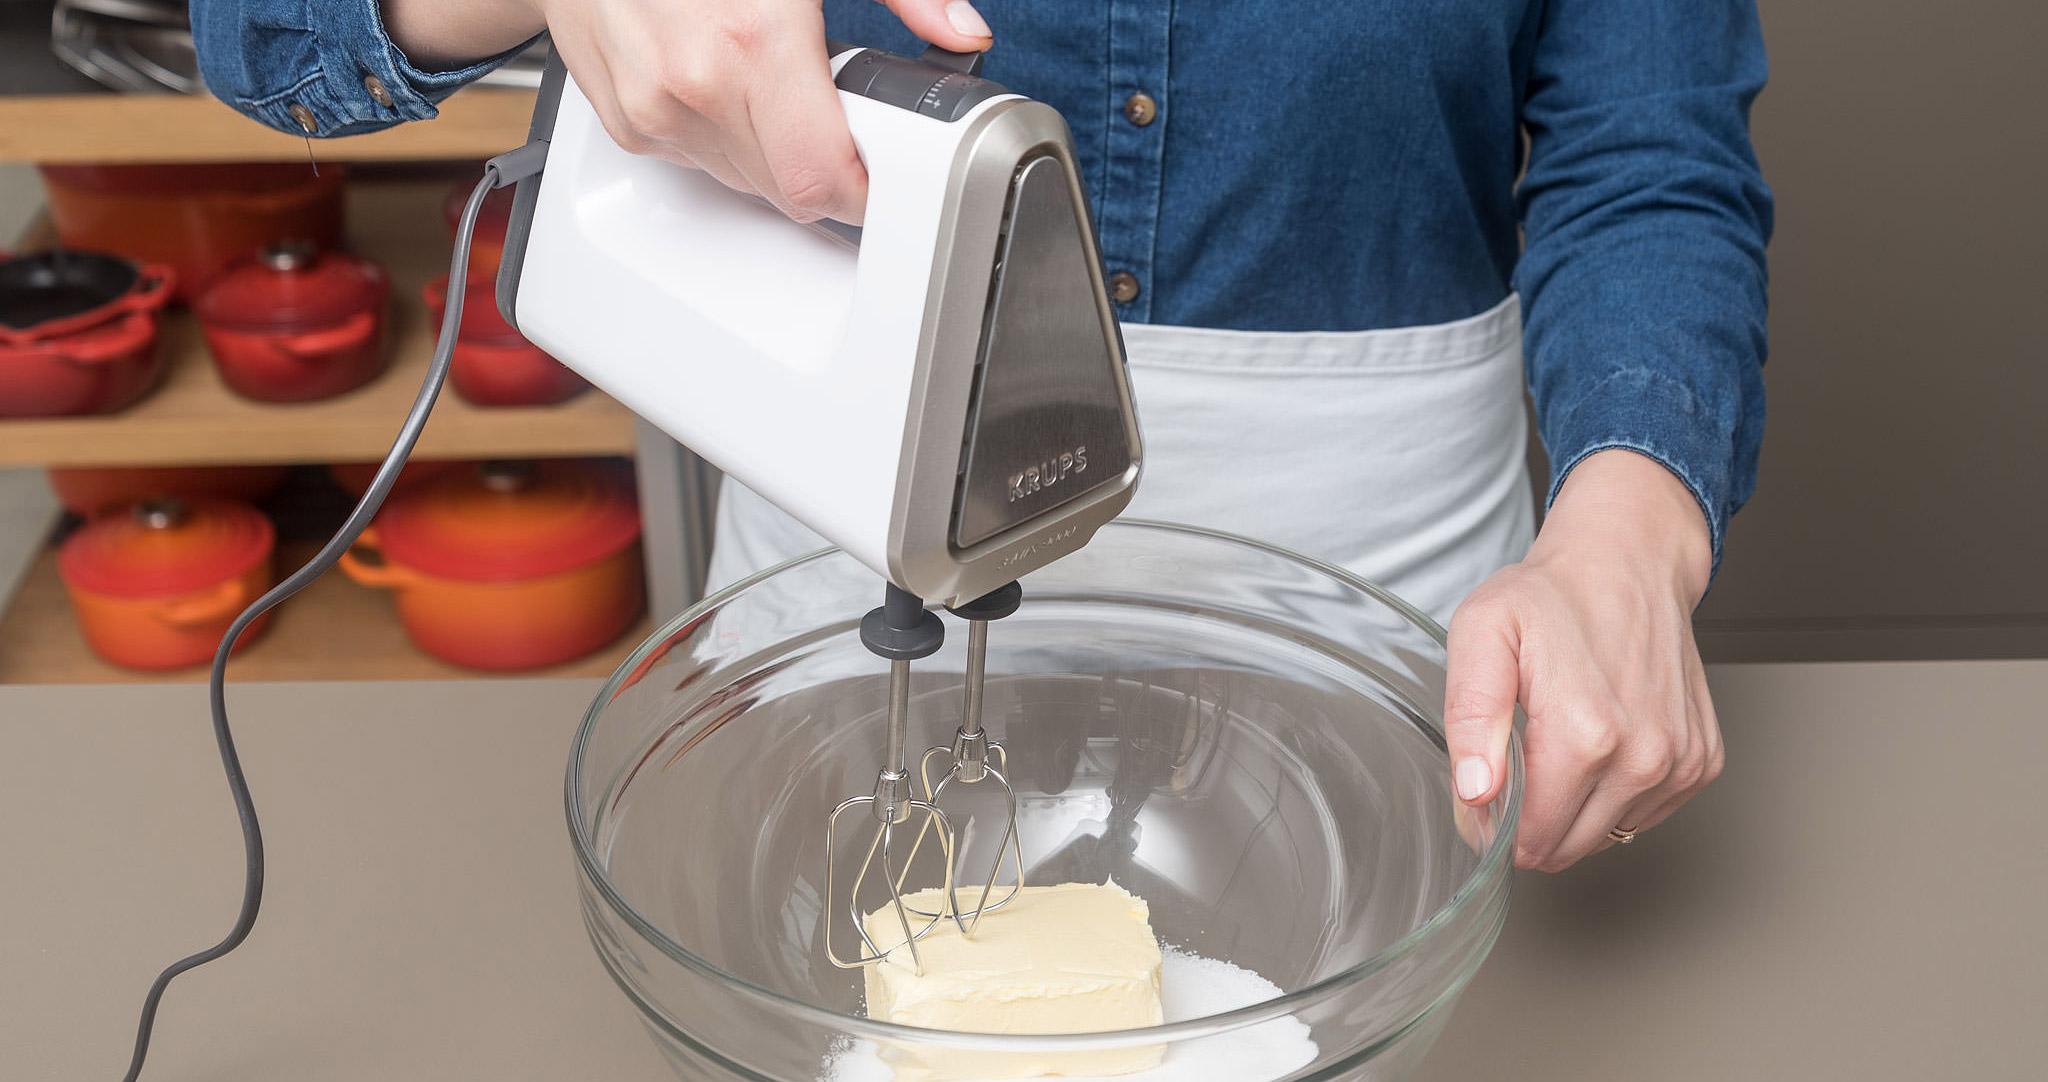 Erdbeer-Streuselkuchen Butter Schüssel